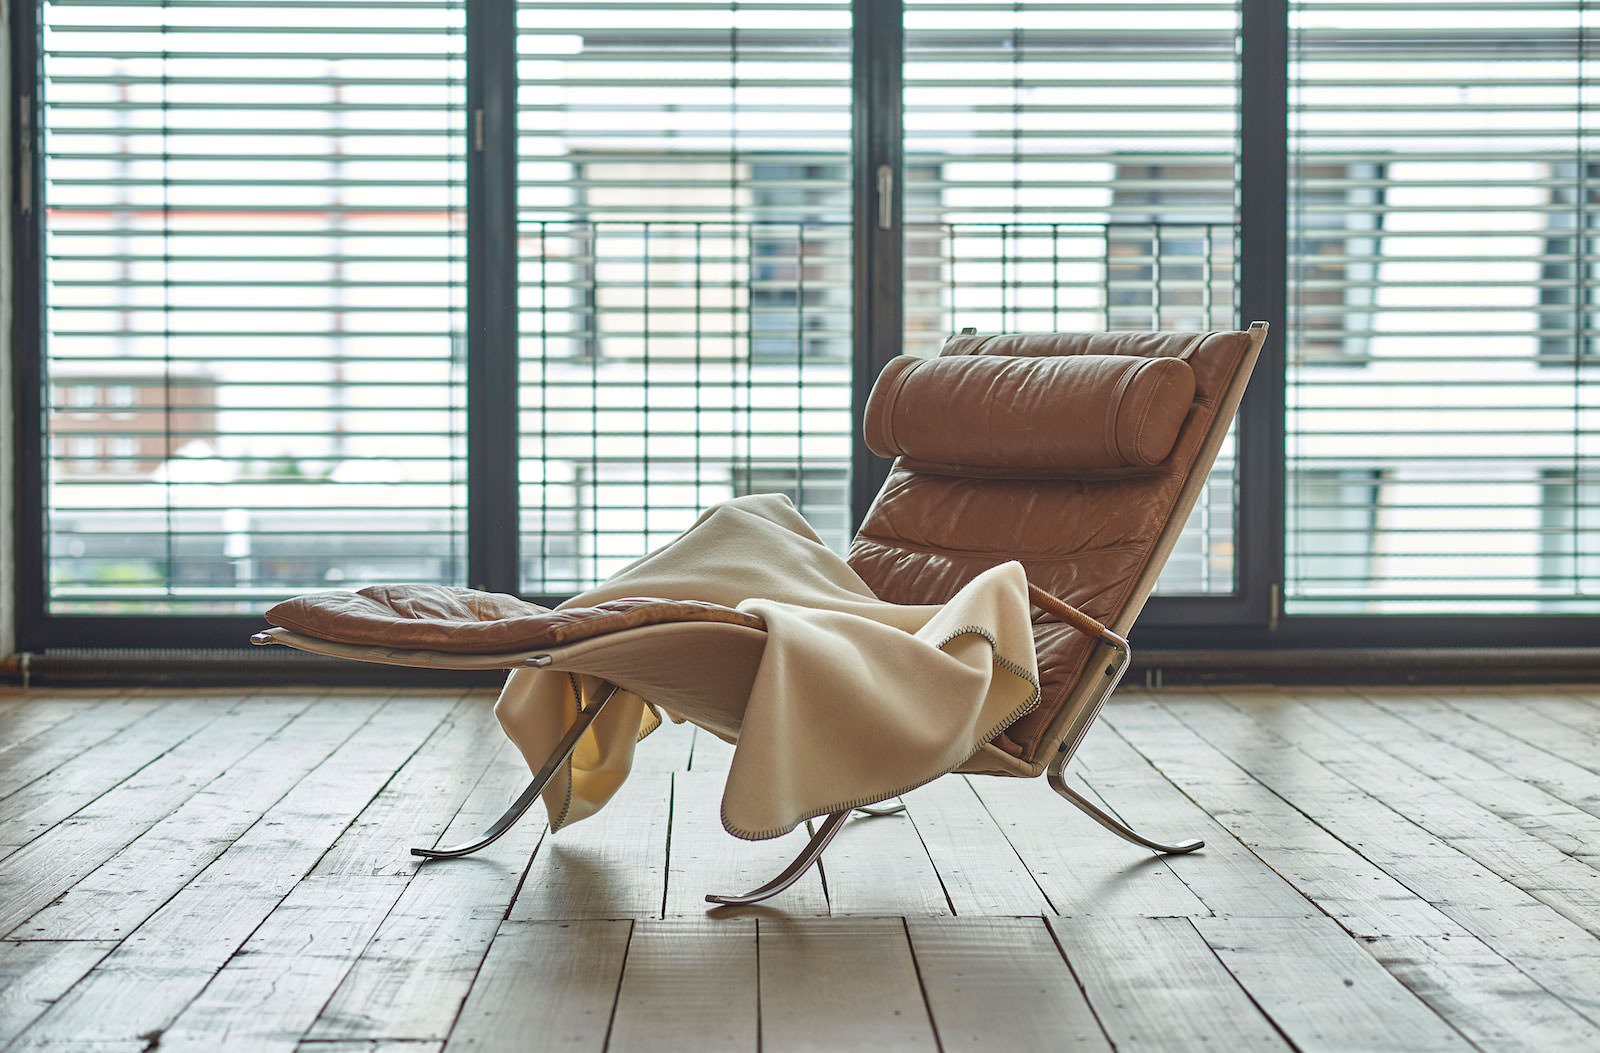 Die Decke – Merino-Decke 155 cm x 200 cm (1600 g)